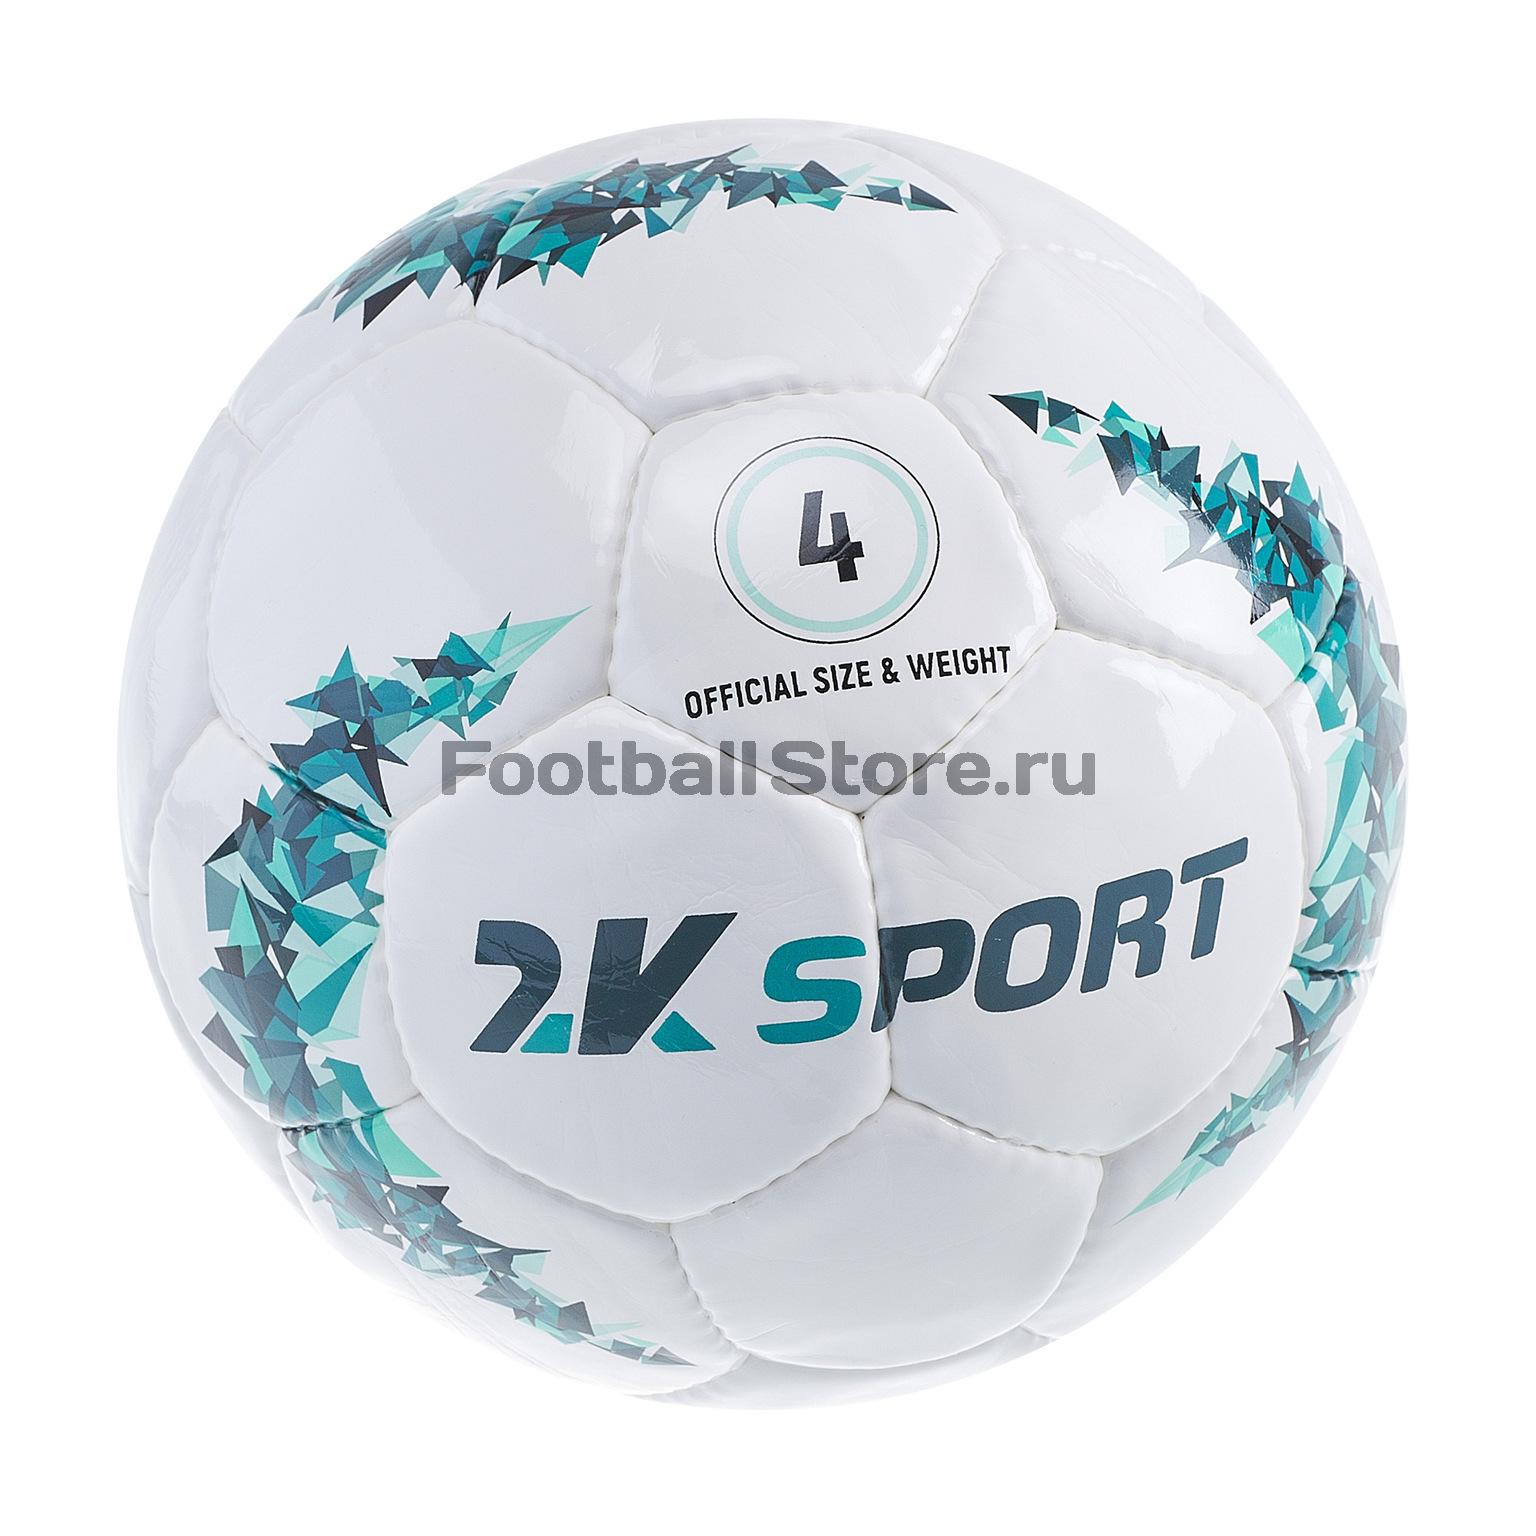 Футбольный мяч 2K Sport Crystal Prime 127087